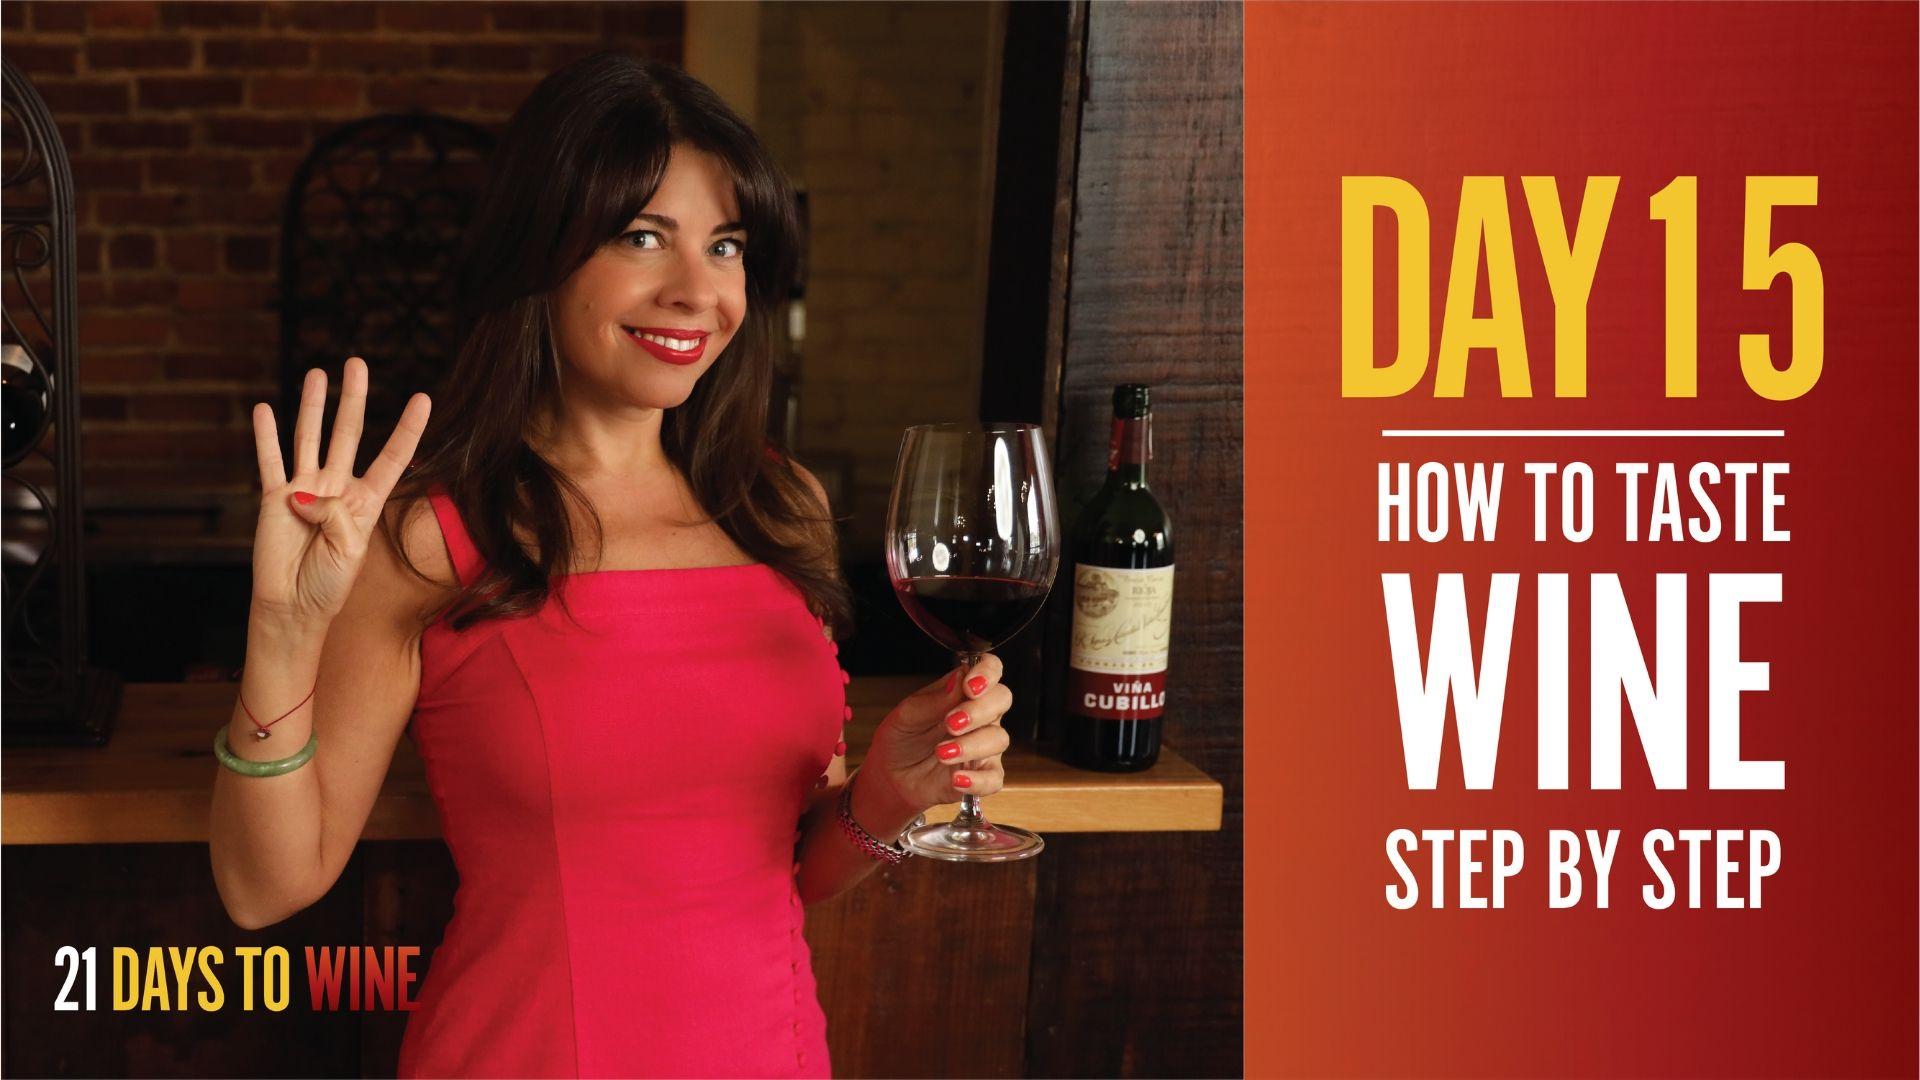 How to Taste Wine Step by Step